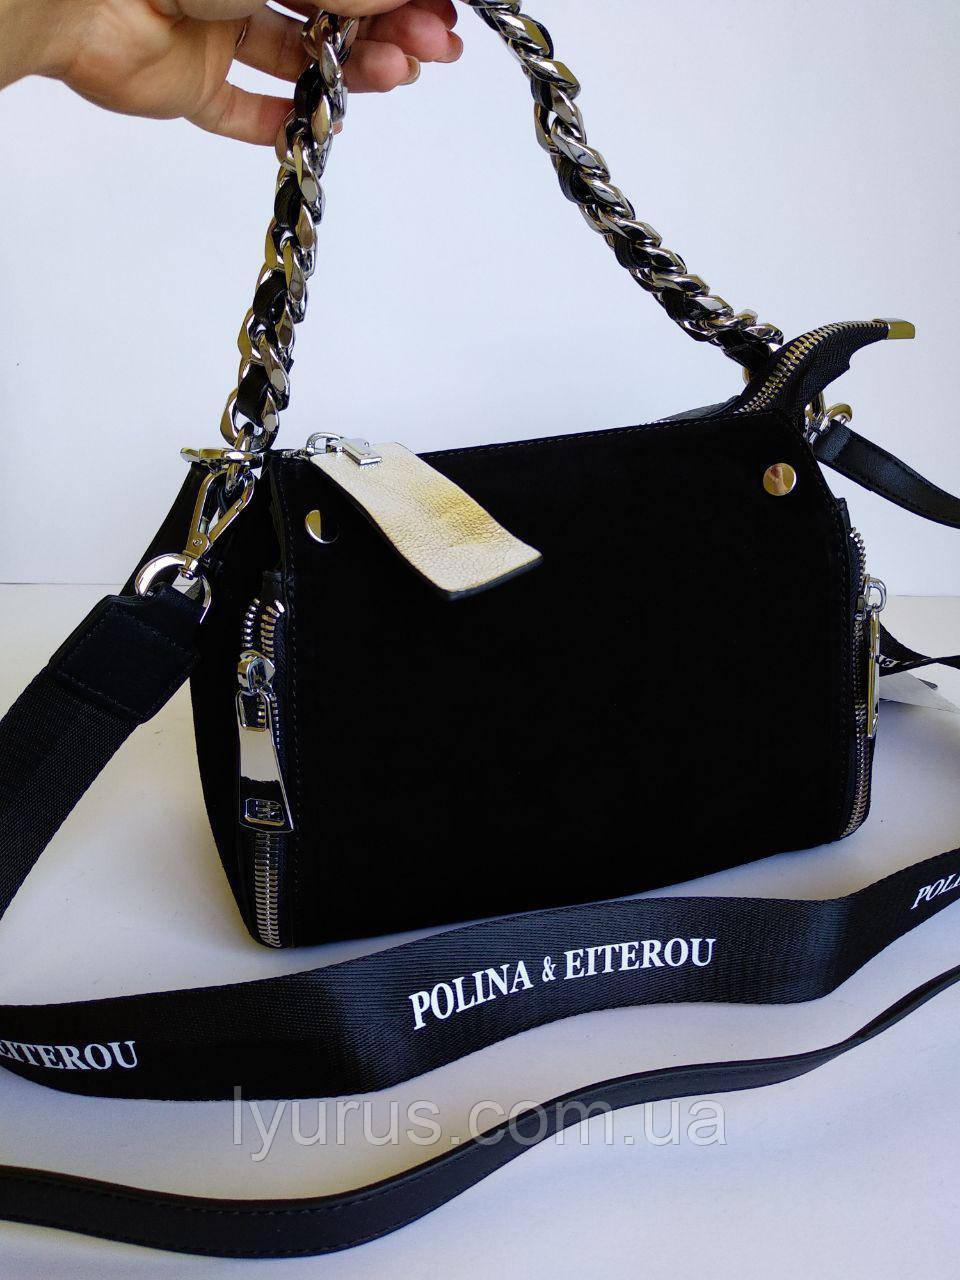 Сумка замшевая черная Polina & Eiterou